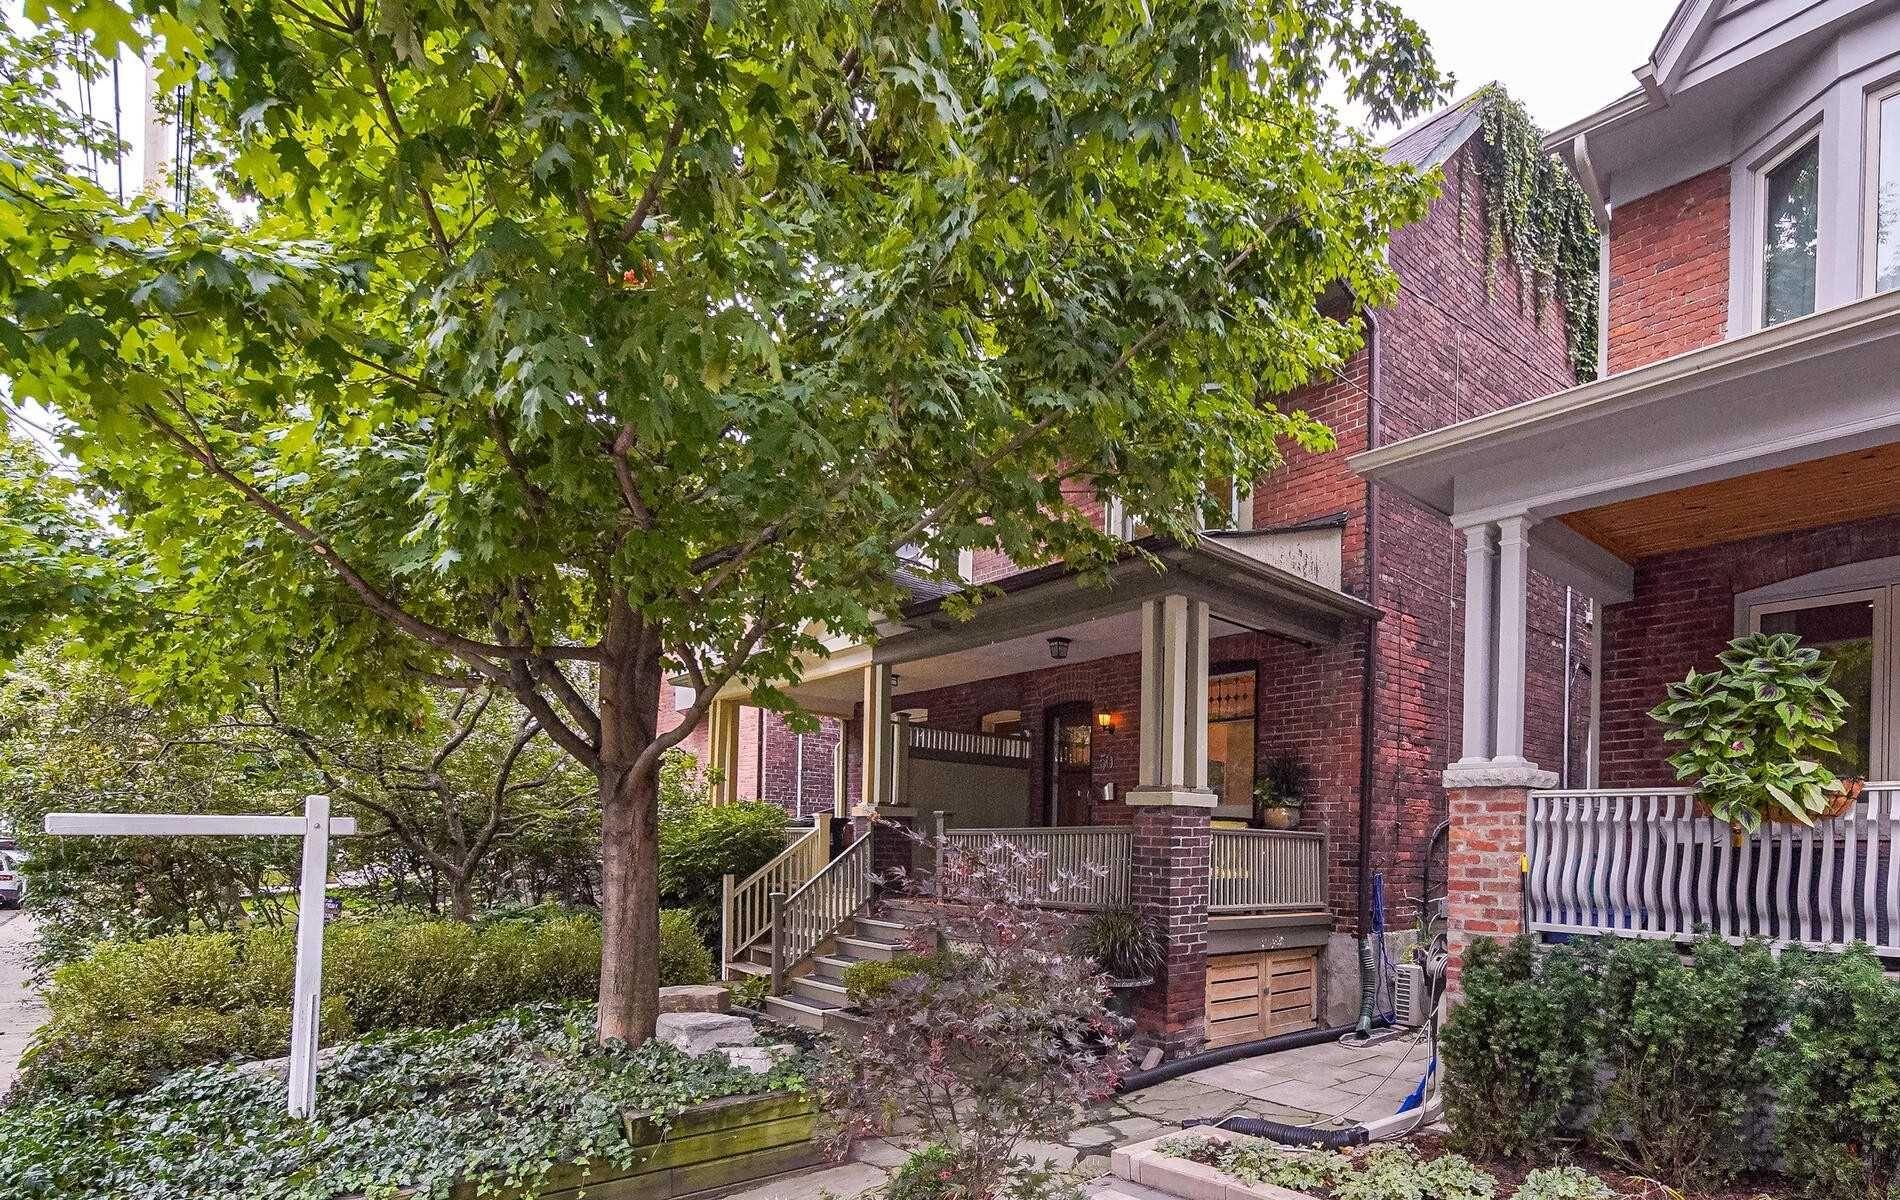 Main Photo: 50 Bertmount Avenue in Toronto: South Riverdale House (3-Storey) for sale (Toronto E01)  : MLS®# E4905178